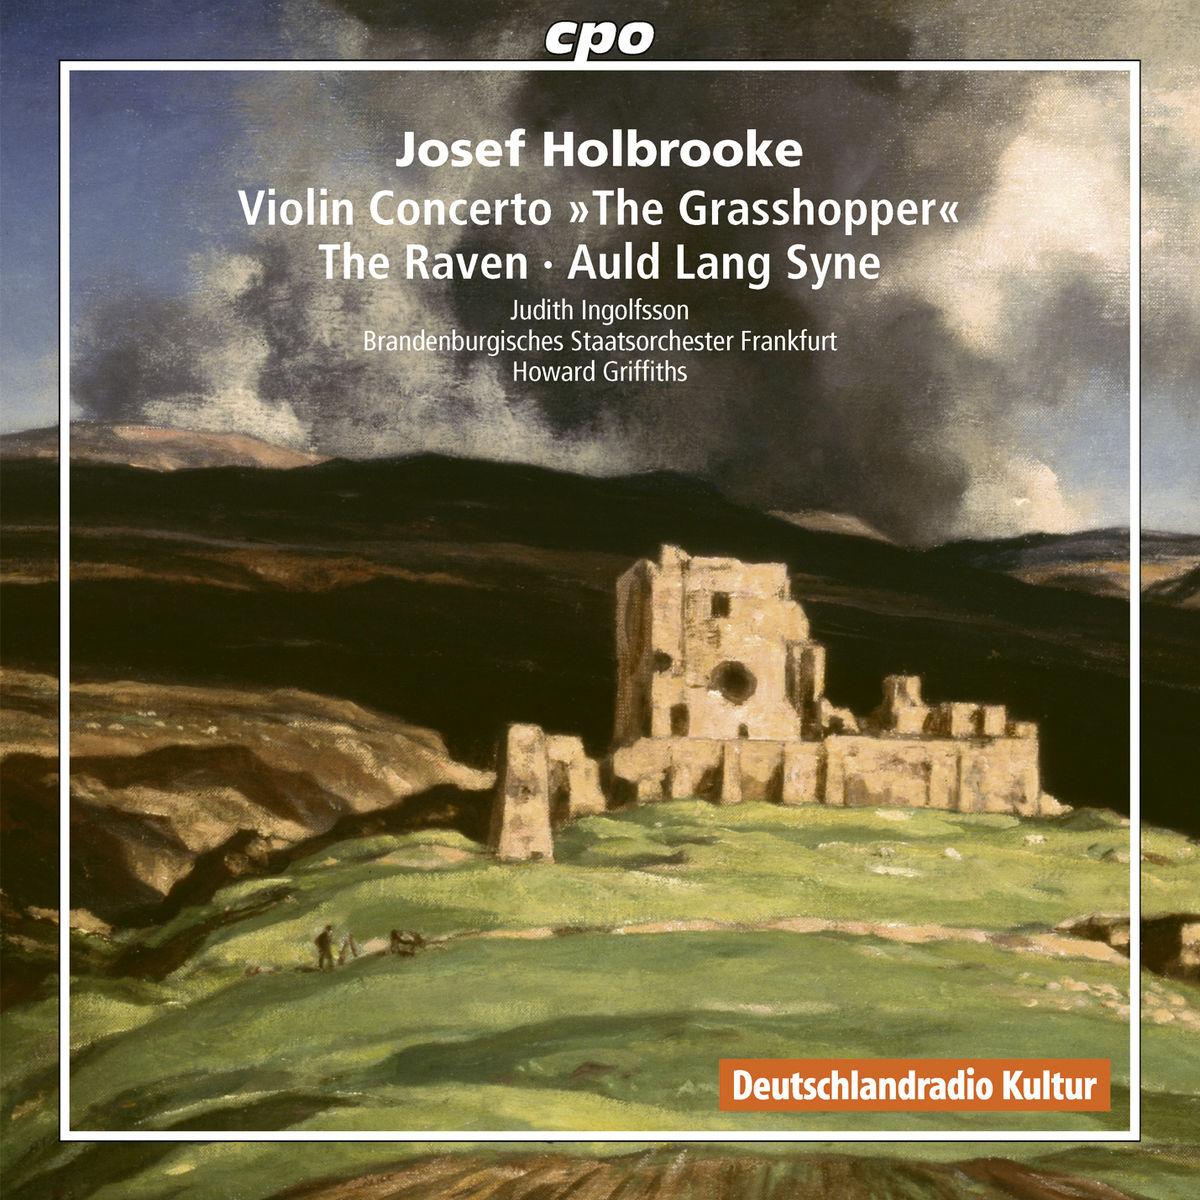 Griffiths, Howard - Holbrooke: Symphonic Poems, Vol. 2 (2016)